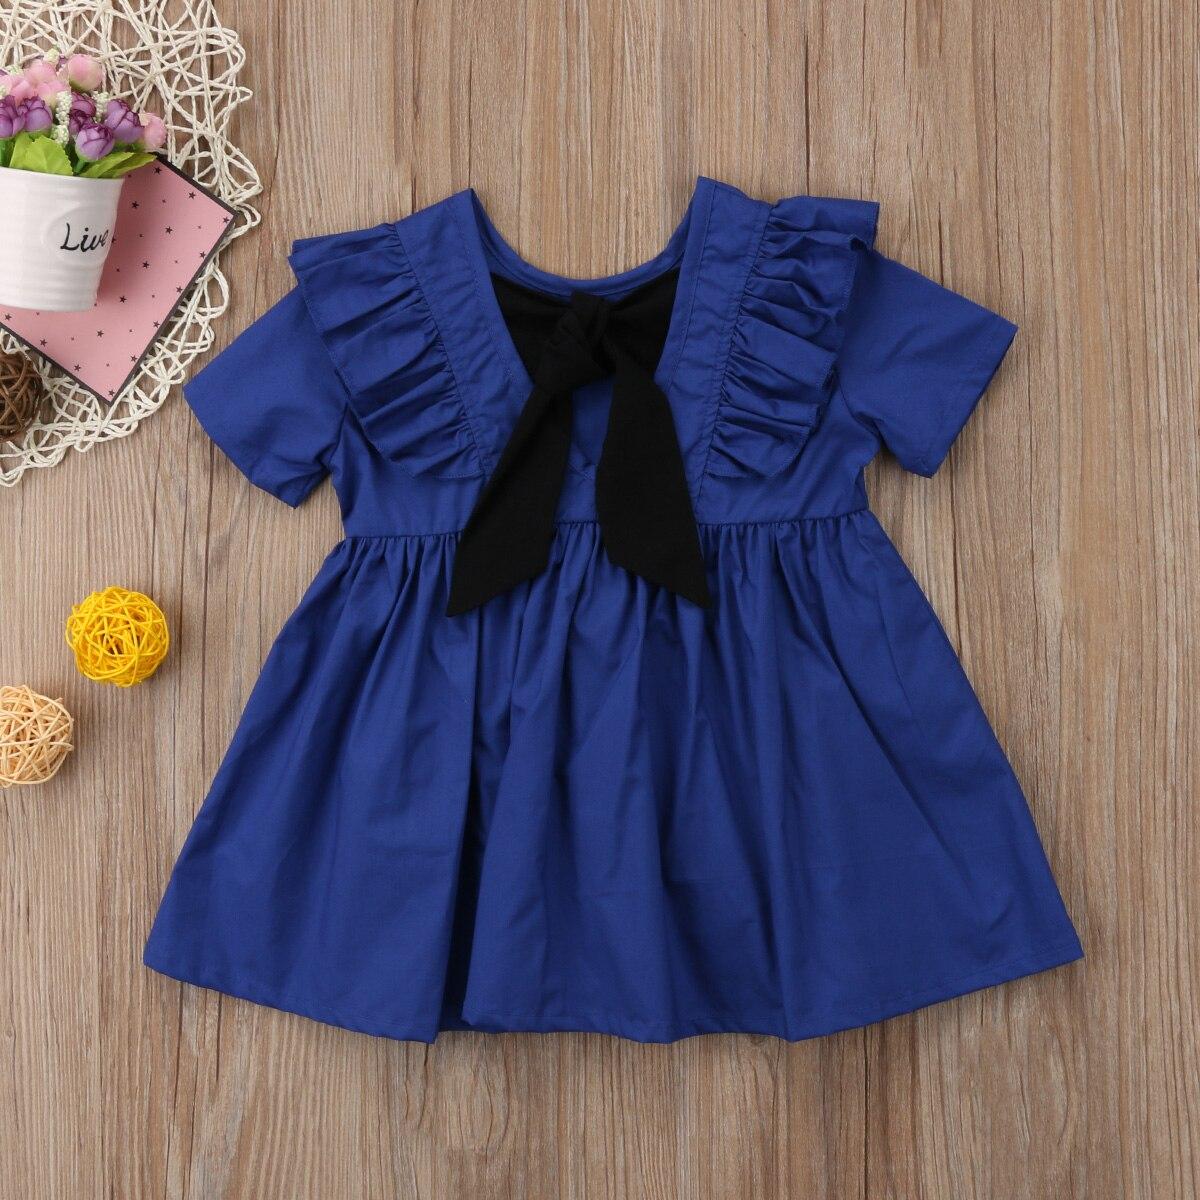 Cute Newborn Baby Girl Kid Party A-Line Dress Spring Summer Short Sleeve Ruffle Vintage Lace Sundress